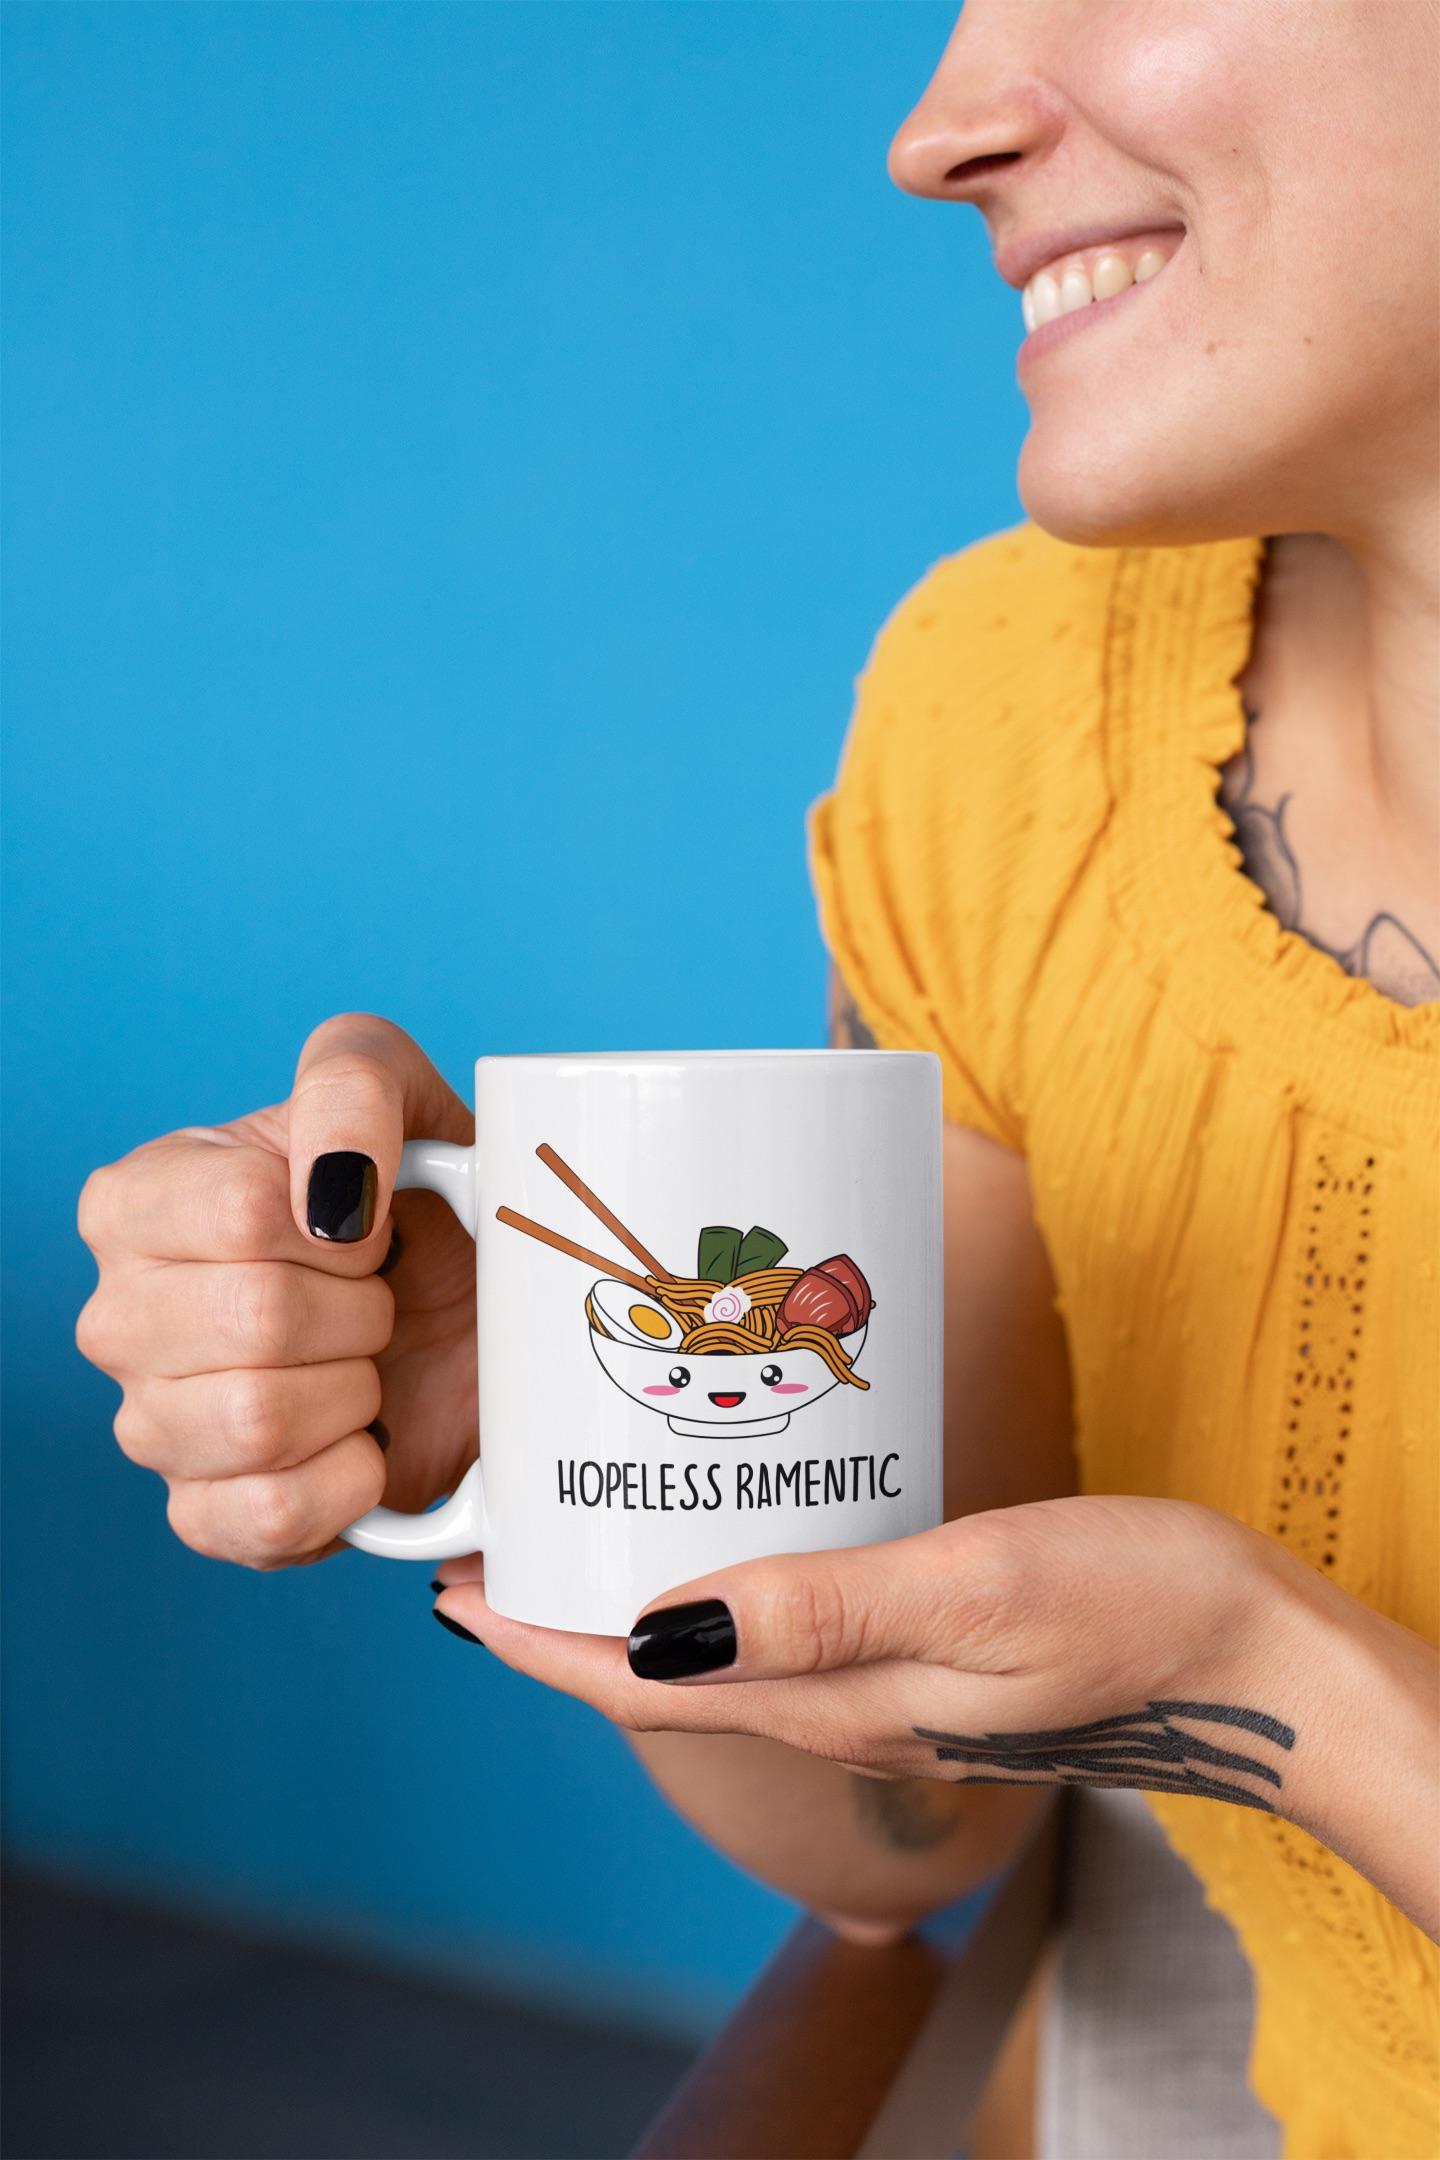 phenom hopeless ramentic mug